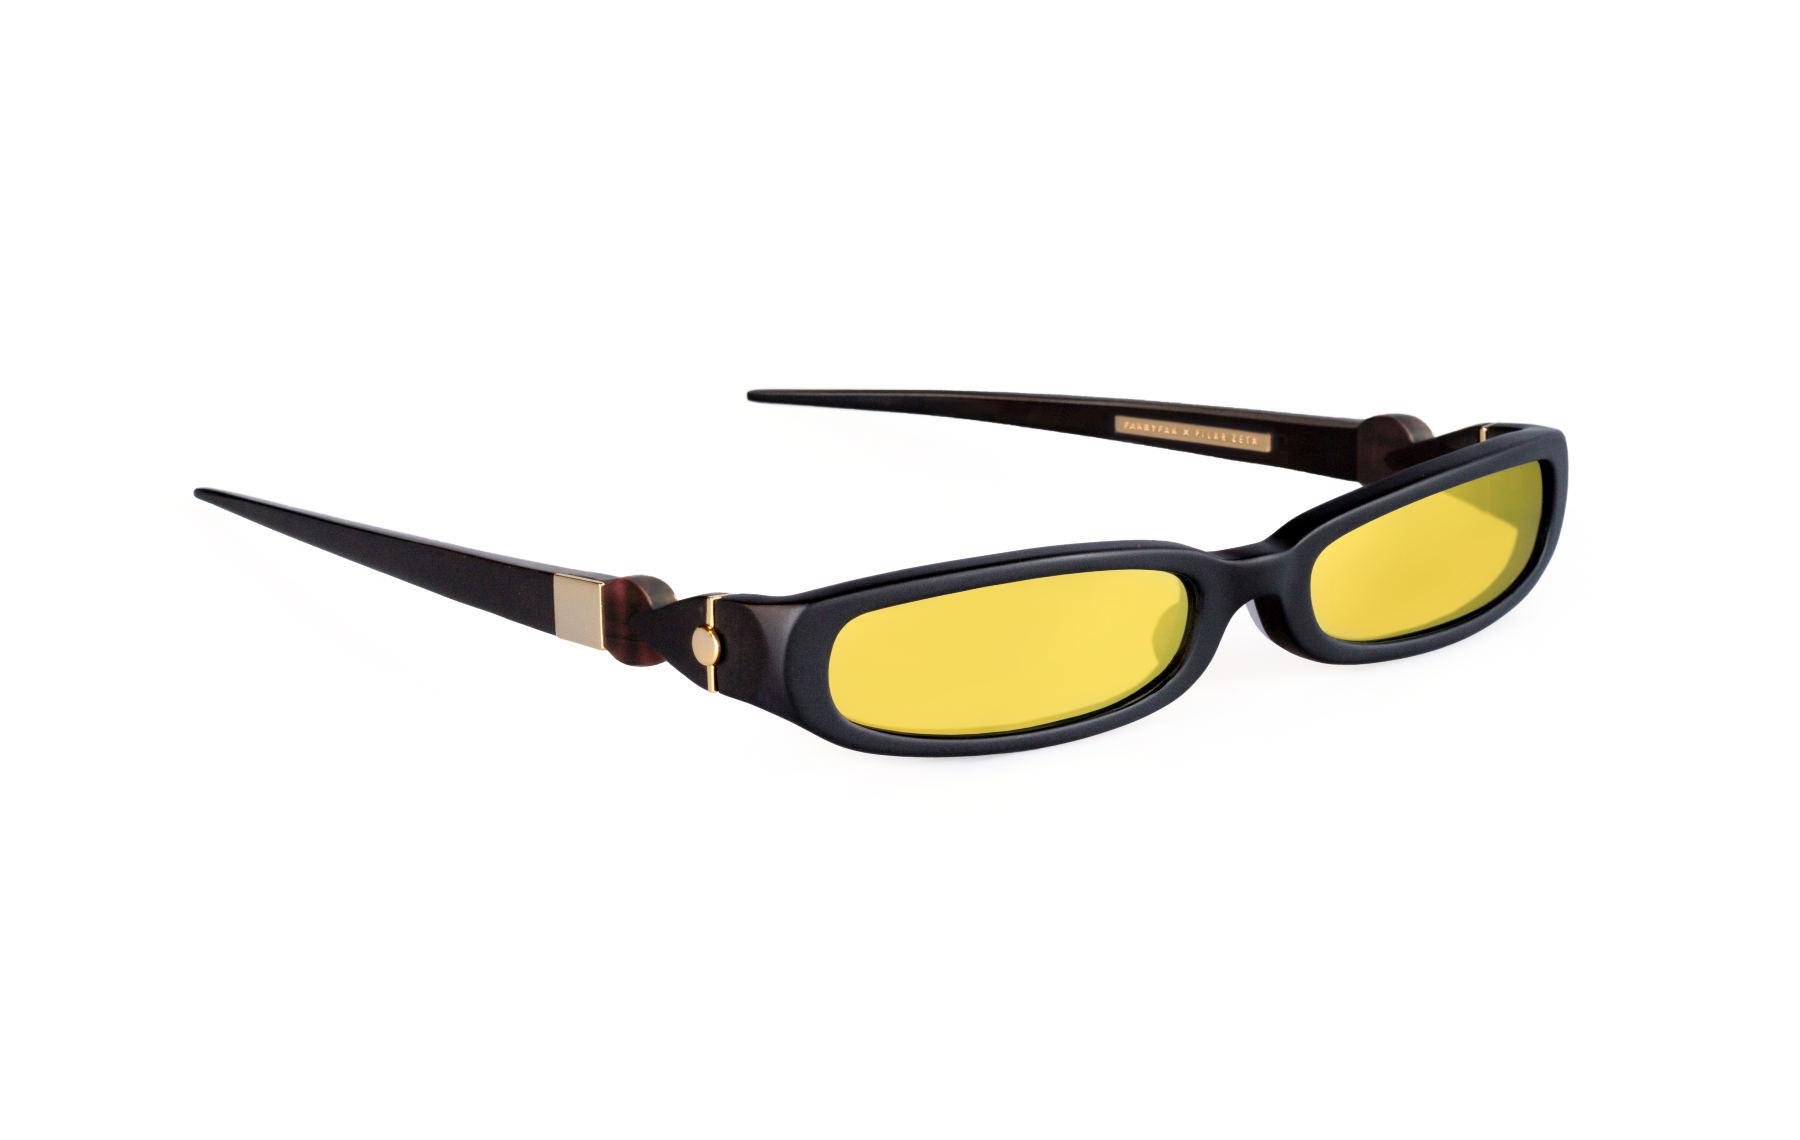 FAKBYFAK x Pilar Zeta  GRACE. Sunglasses. Matte Black & Gold Code: FBF-14-02-02